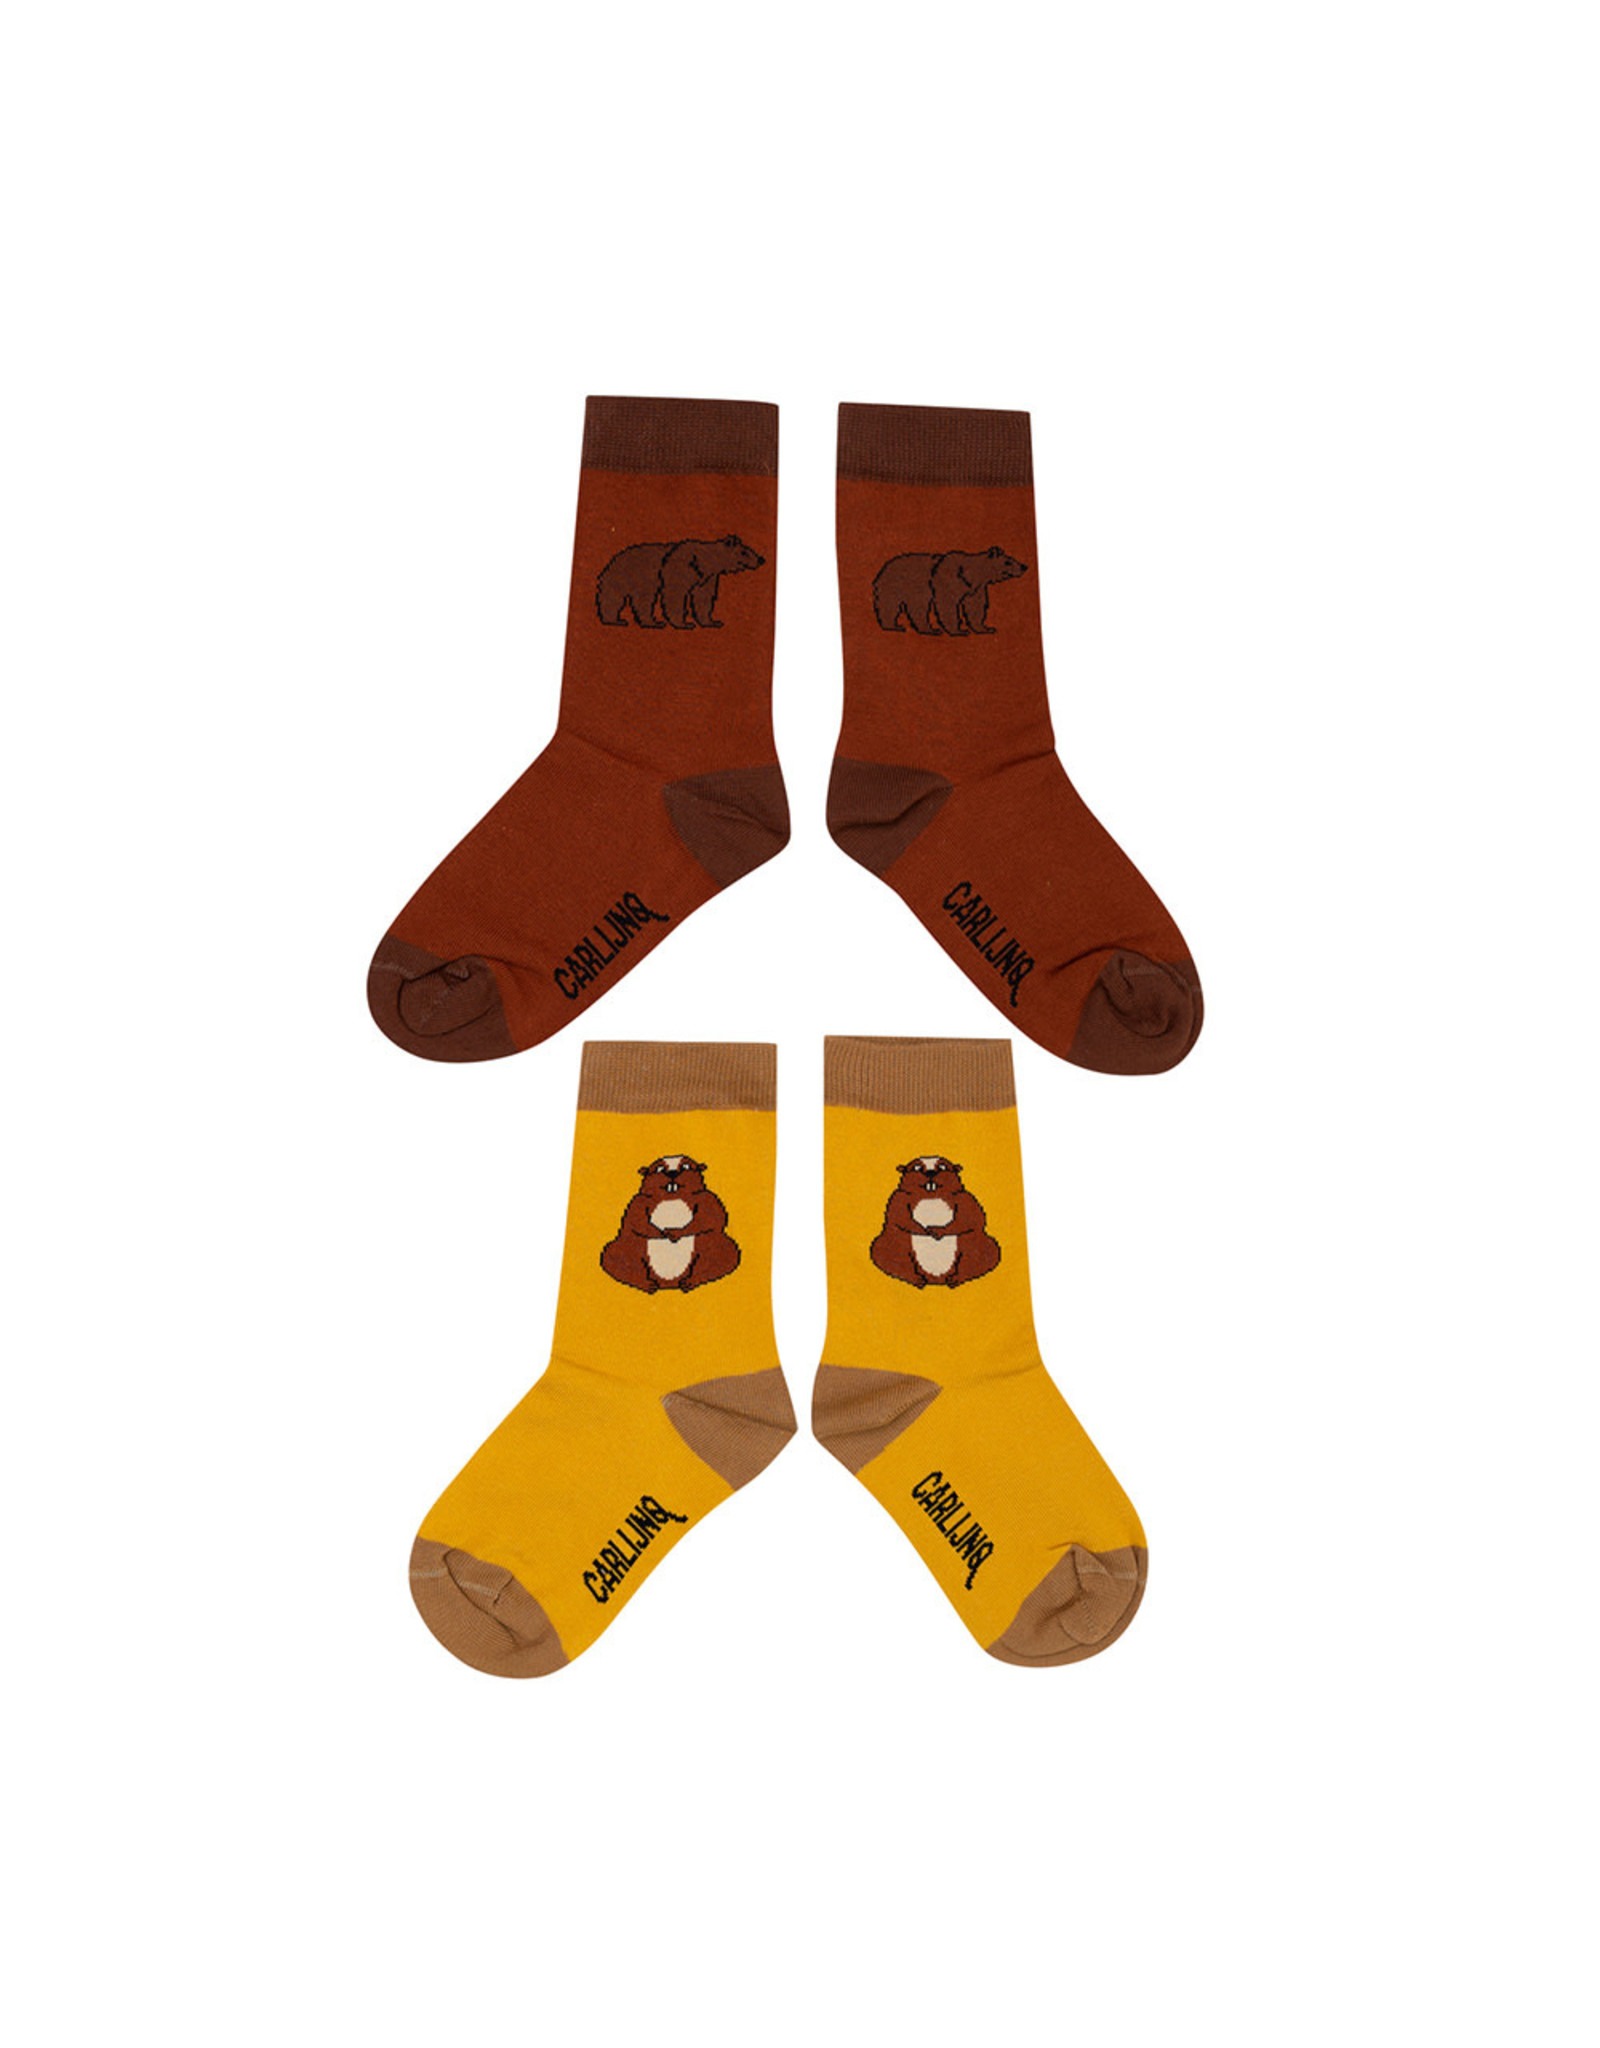 Carlijn Q Carlijn Q Socks Set - Alpine Marmot & Grizzly